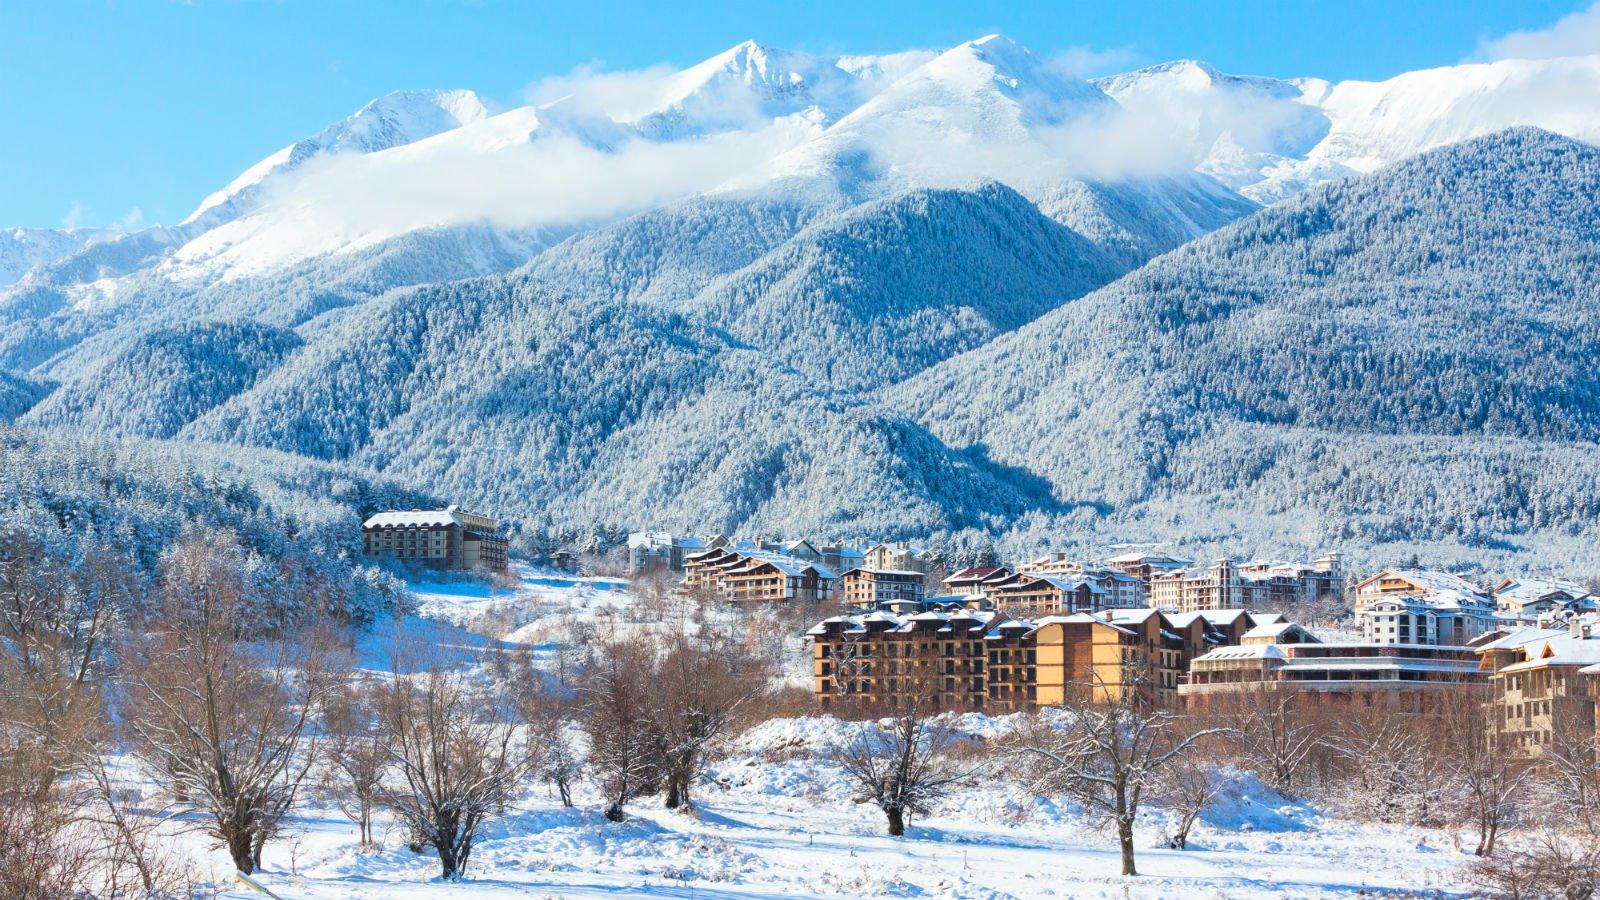 Super Reducere Sejur Ski in Bansko Ianuarie - Februarie 5 nopti de la doar 139 Euro/persoana!